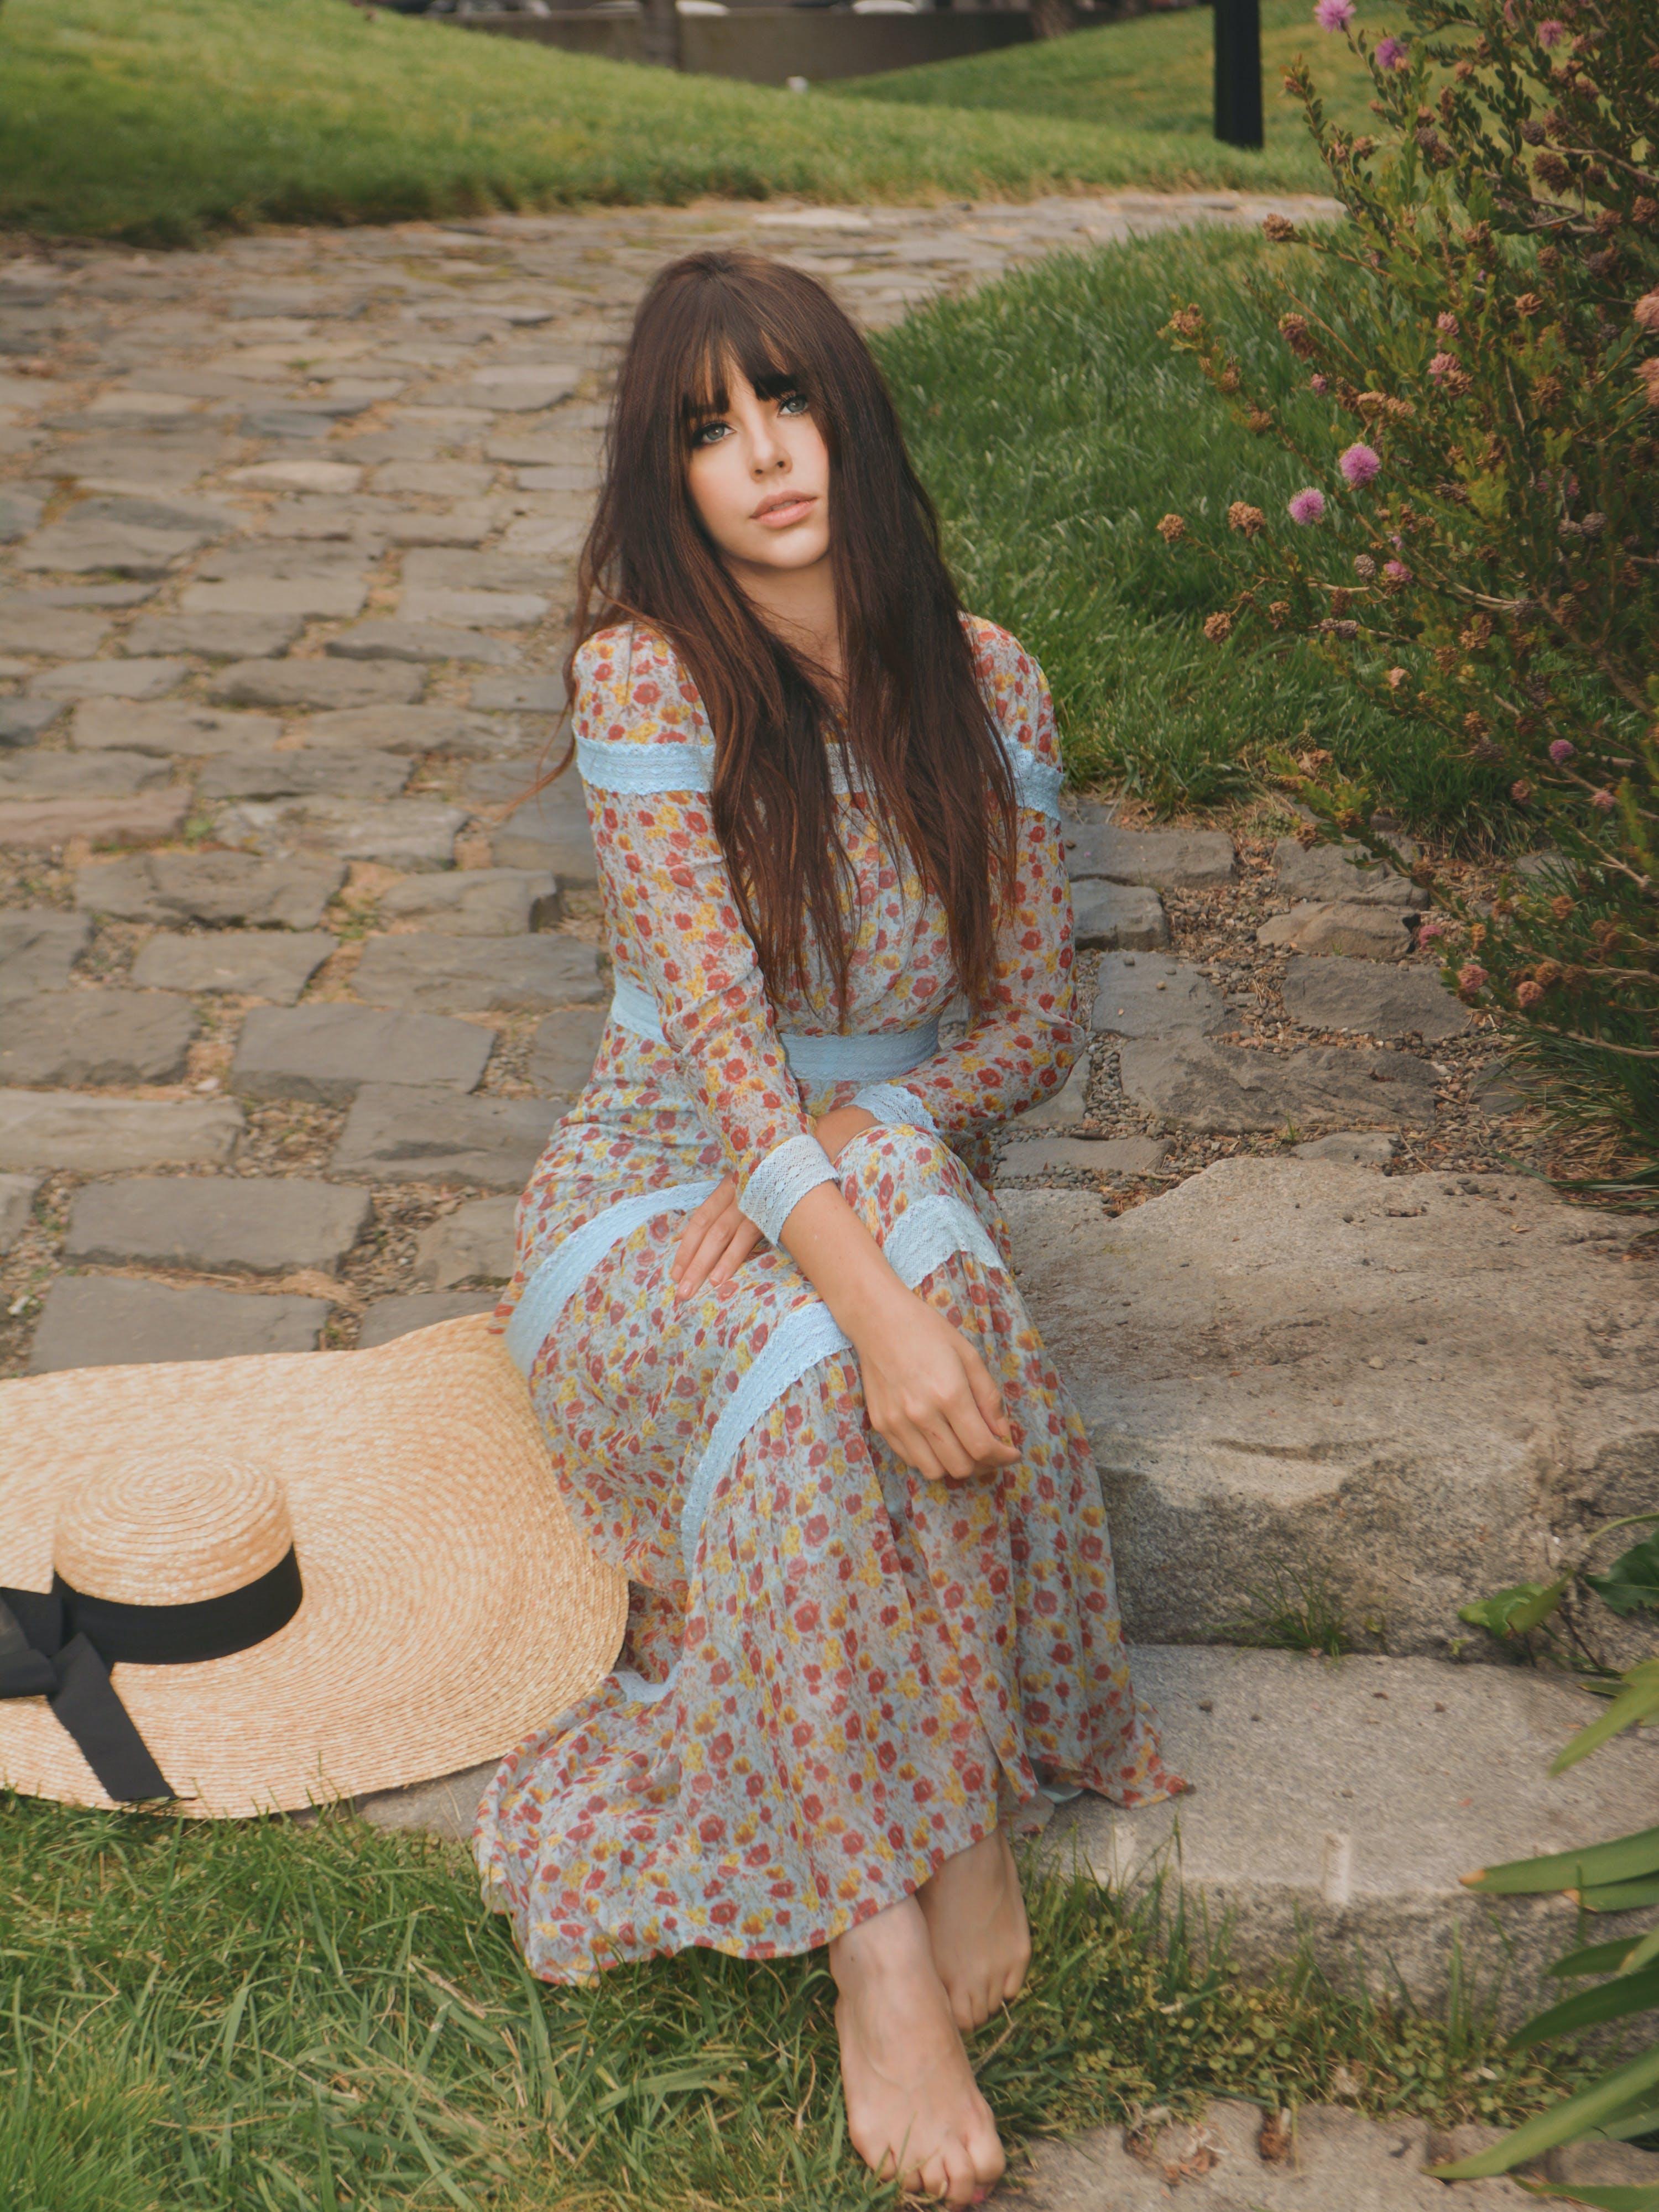 Shabby Chic - Verified Partner Hawthorne Garden Maxi Dress - XS - Also in: S, L, M  - Blue